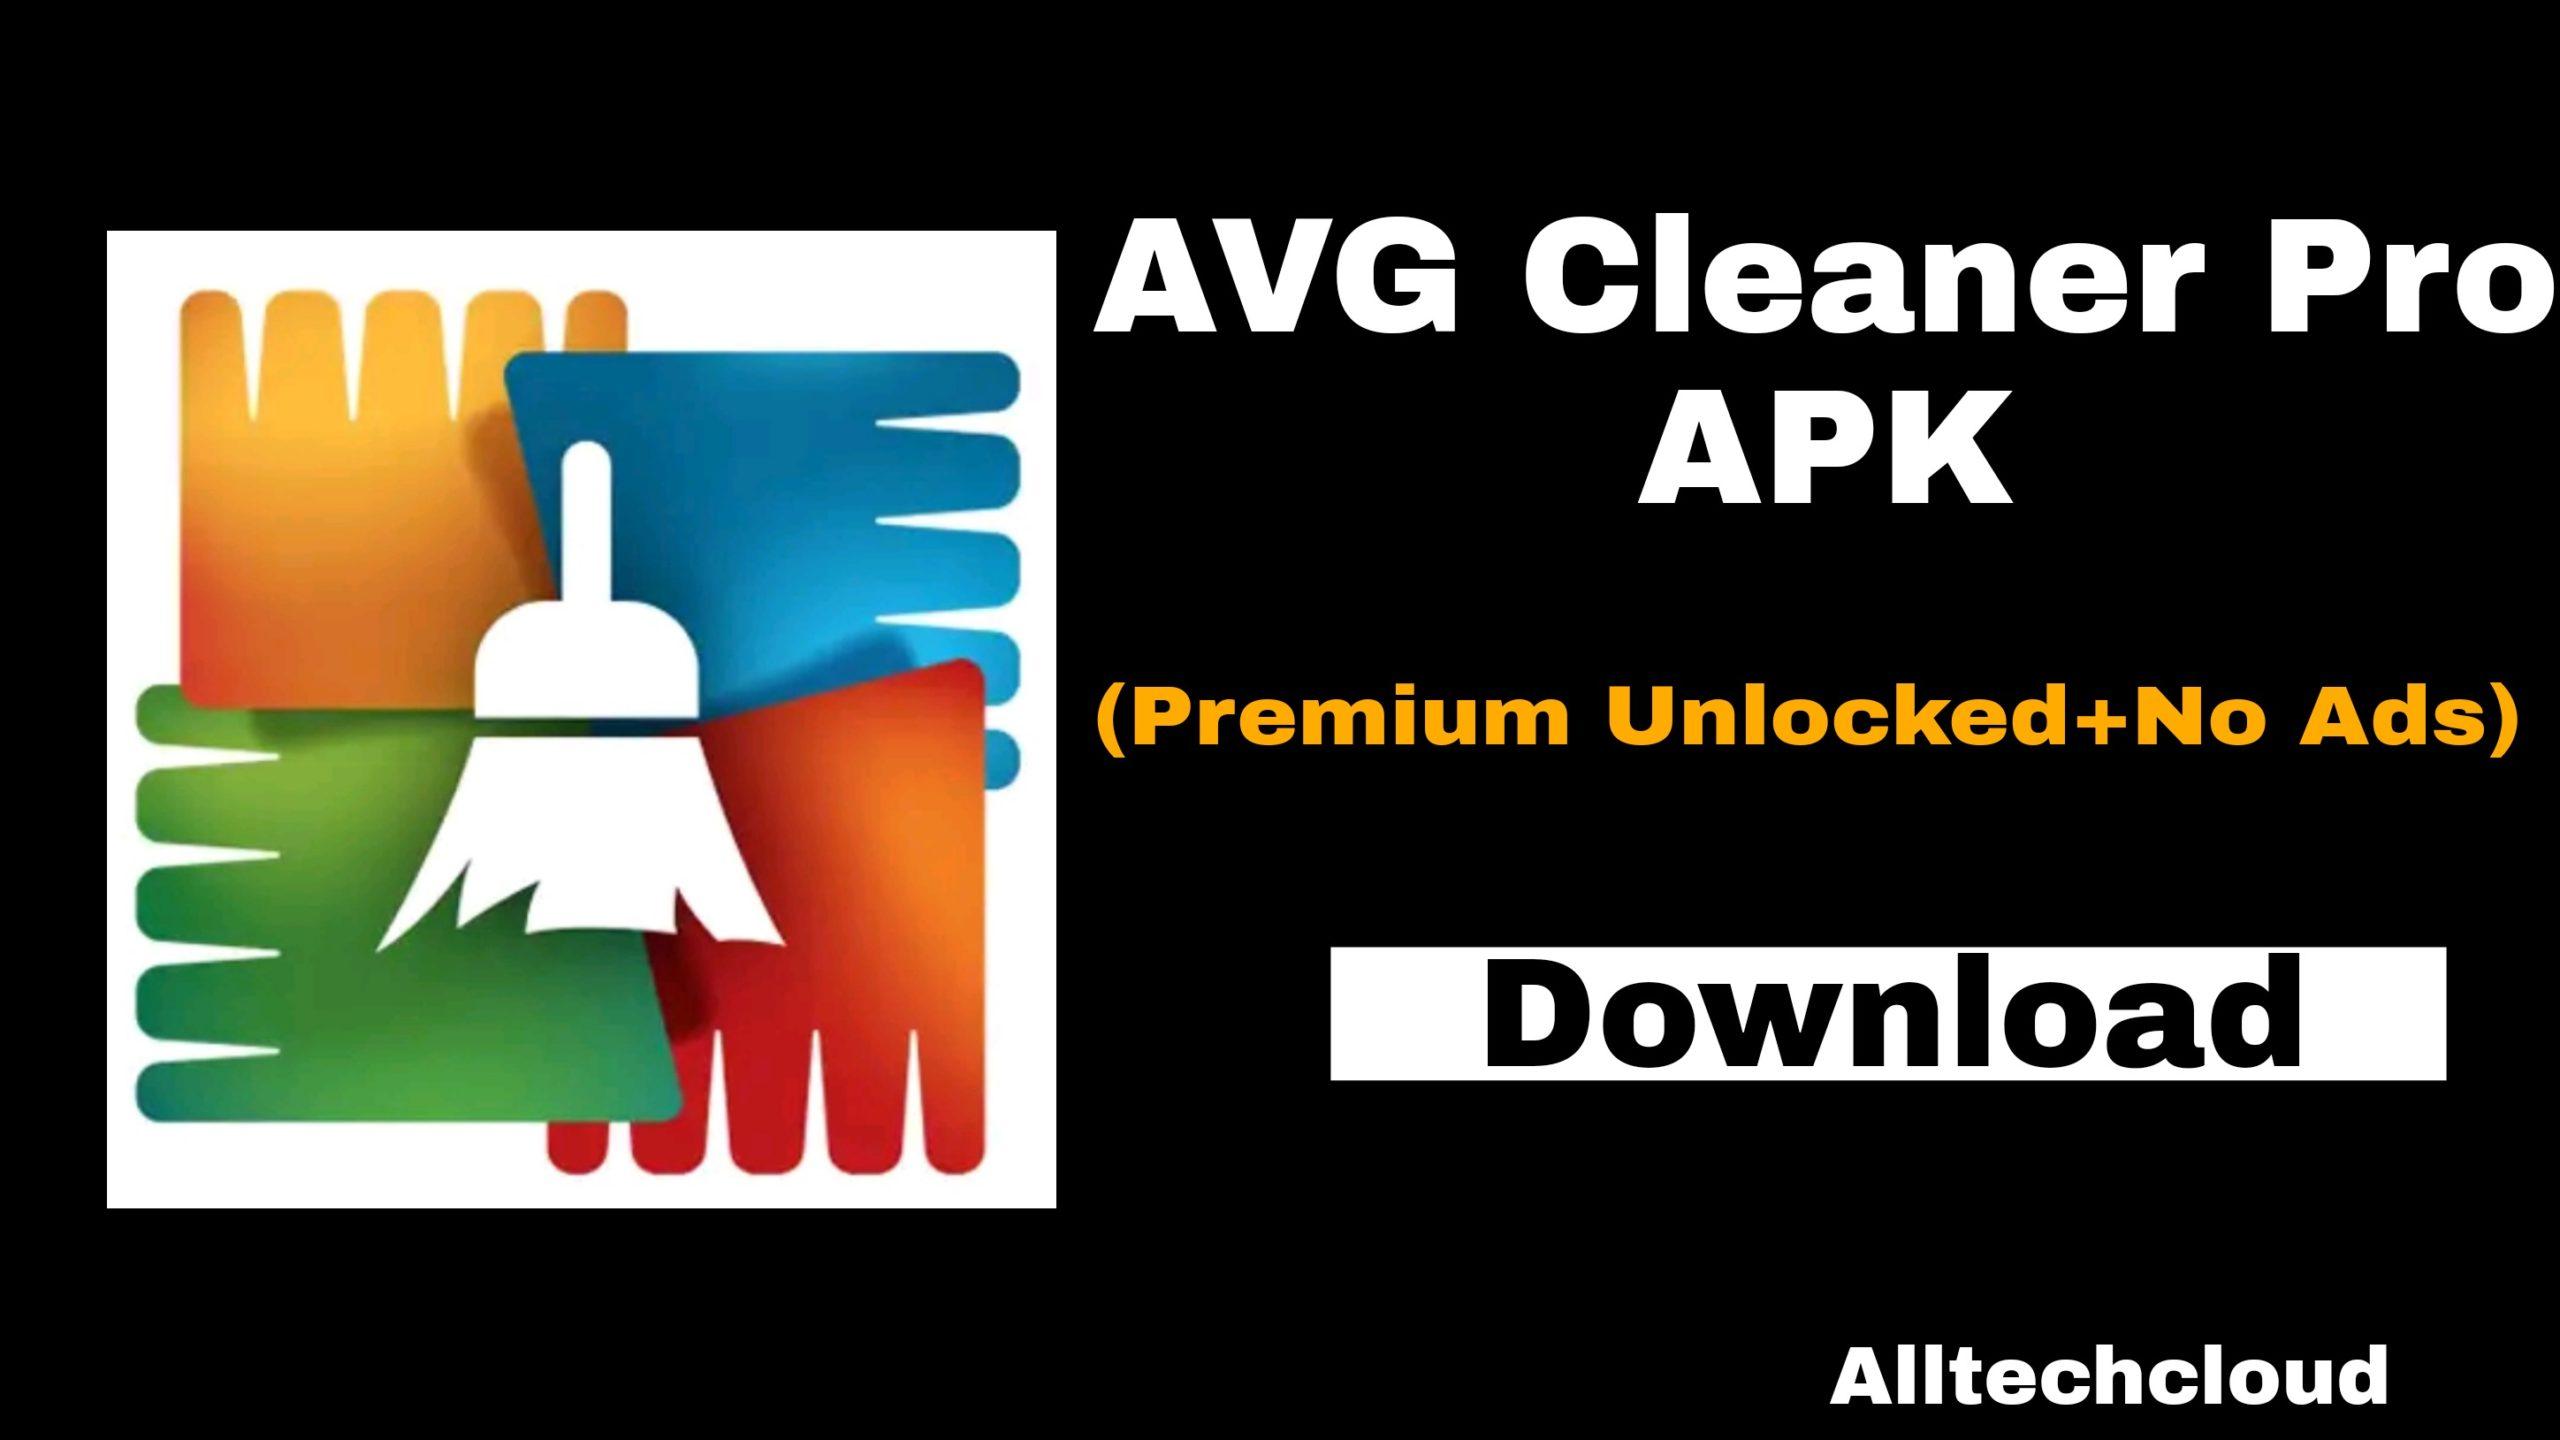 Avg Cleaner Pro APK v6.6.0 Premium Unlocked (No Ads) 2021